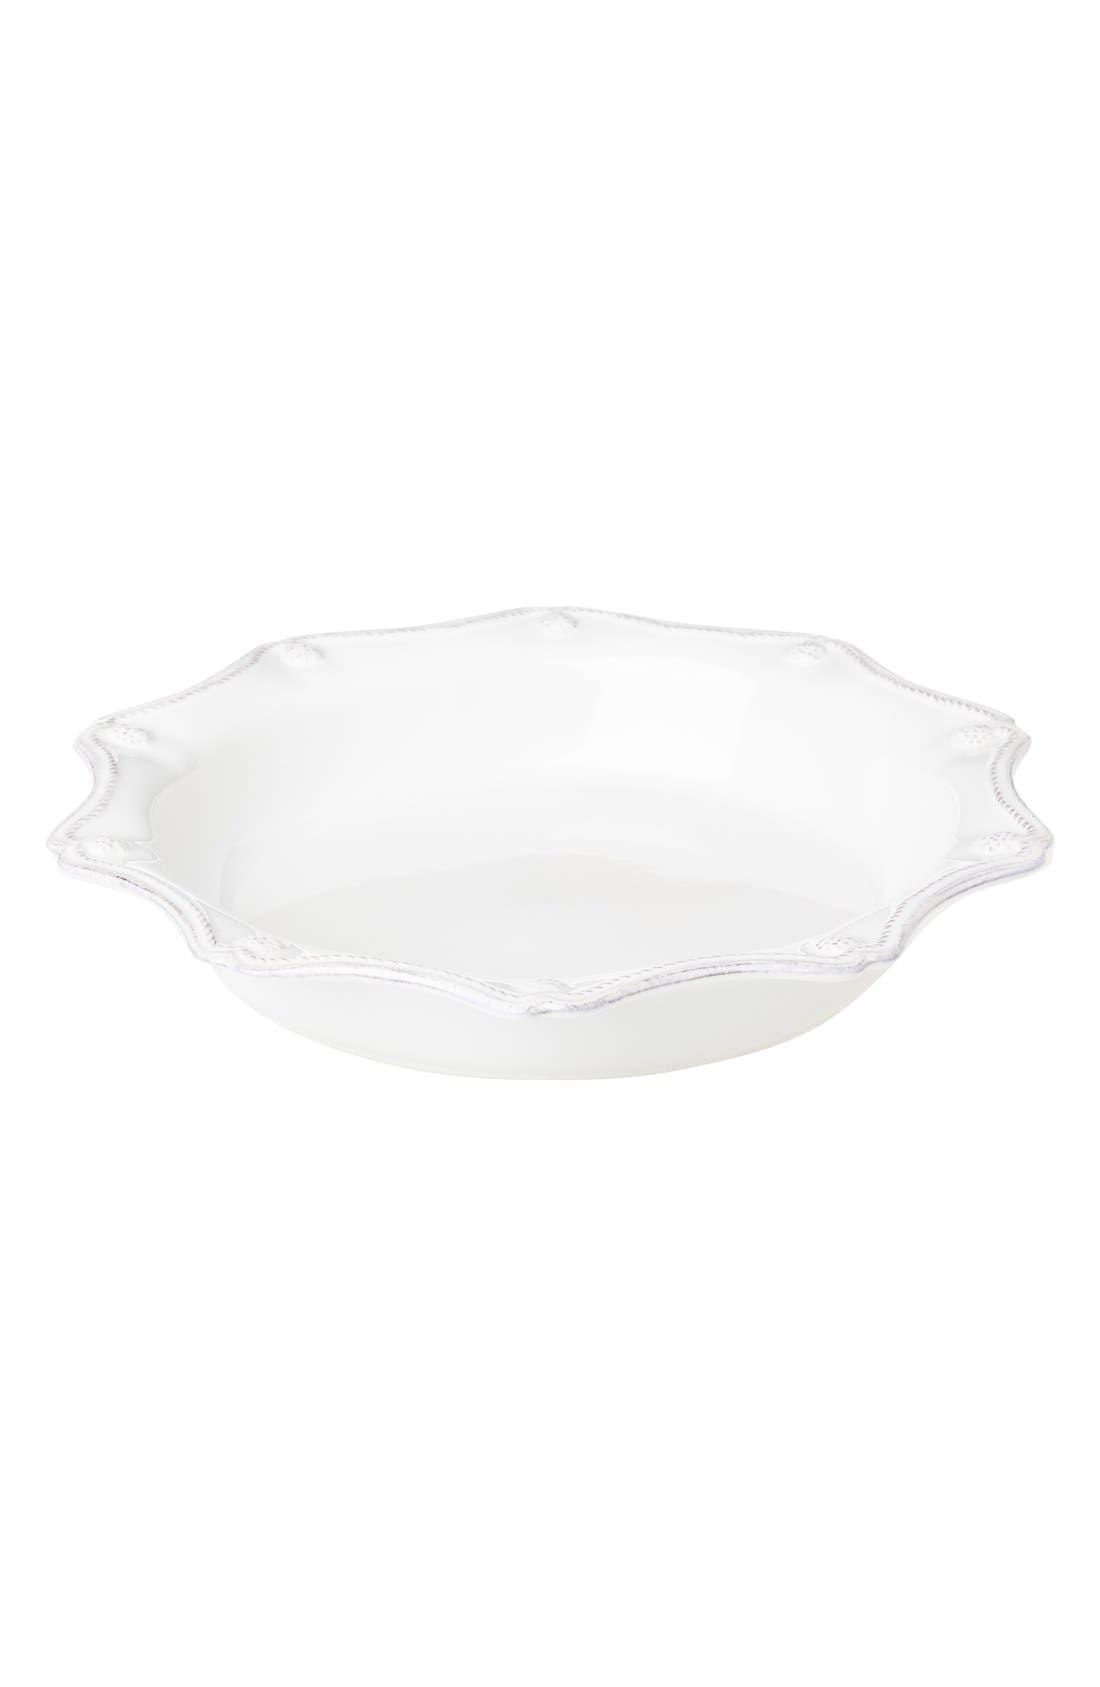 Juliska'Berry and Thread' Ceramic Pie Dish